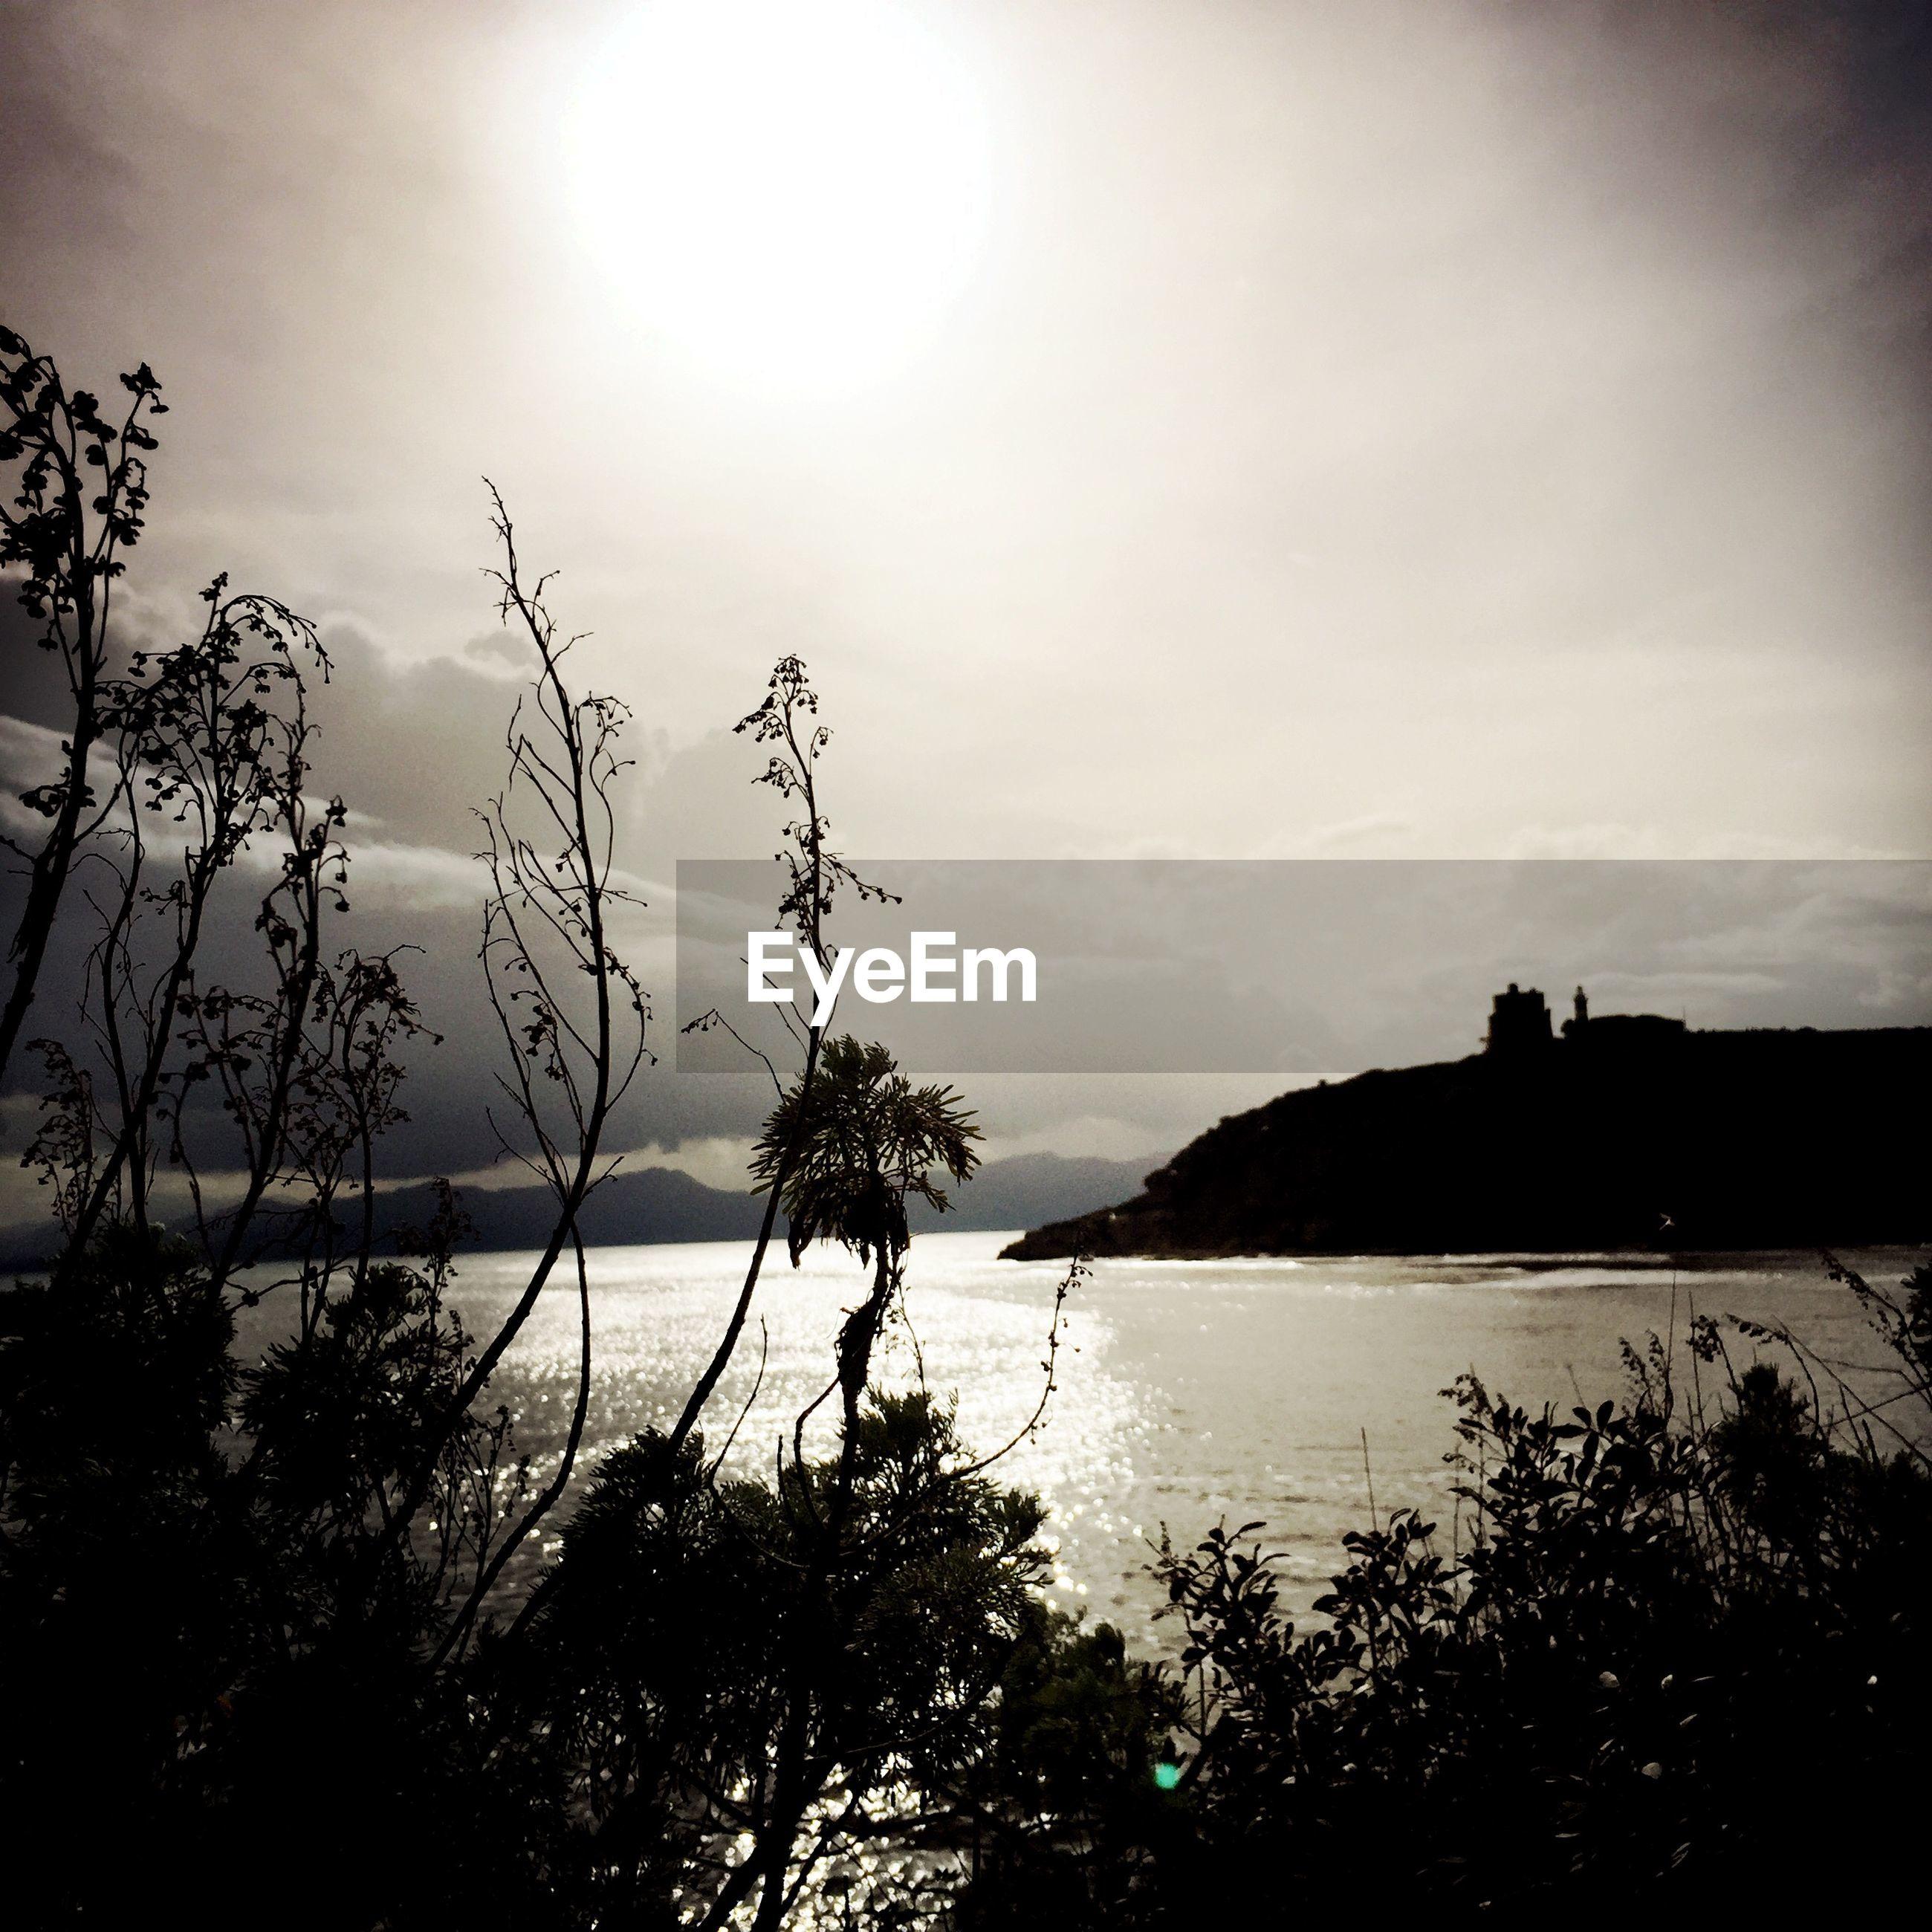 water, sea, tranquil scene, tranquility, sky, scenics, beauty in nature, silhouette, horizon over water, nature, tree, beach, shore, idyllic, plant, sun, sunset, calm, sunlight, cloud - sky